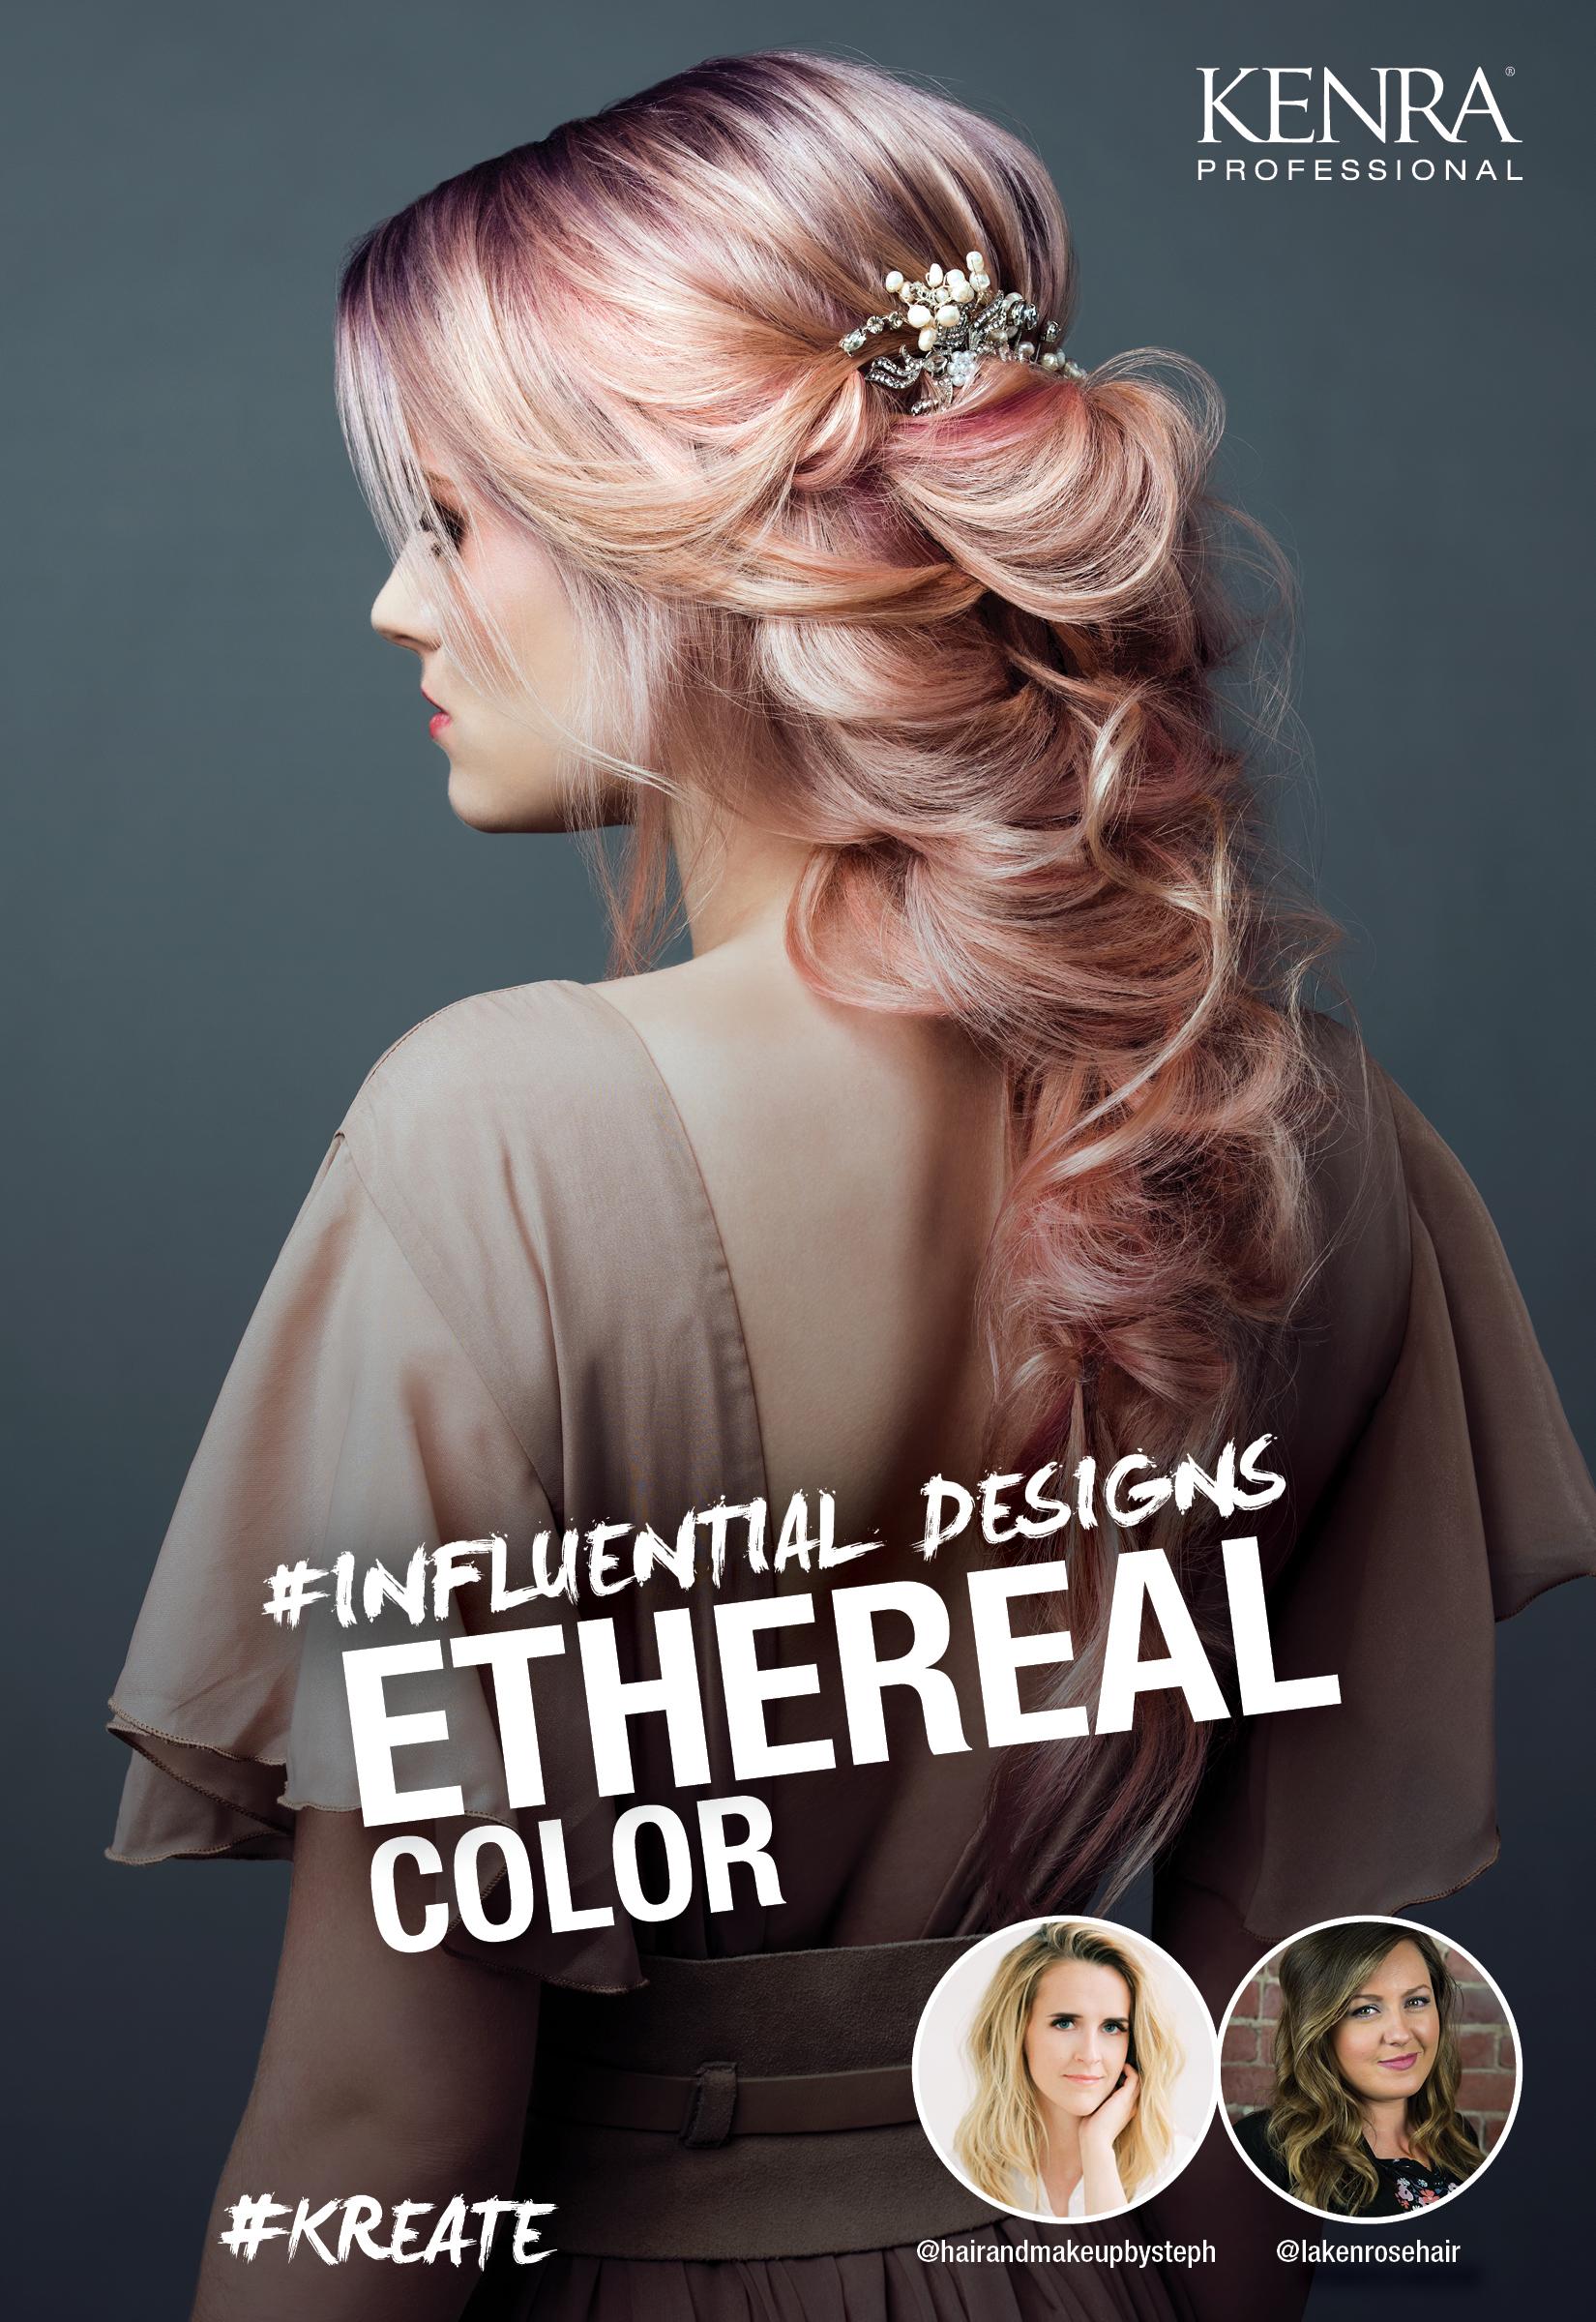 99447_ID_Ethereal_Color_web.jpg